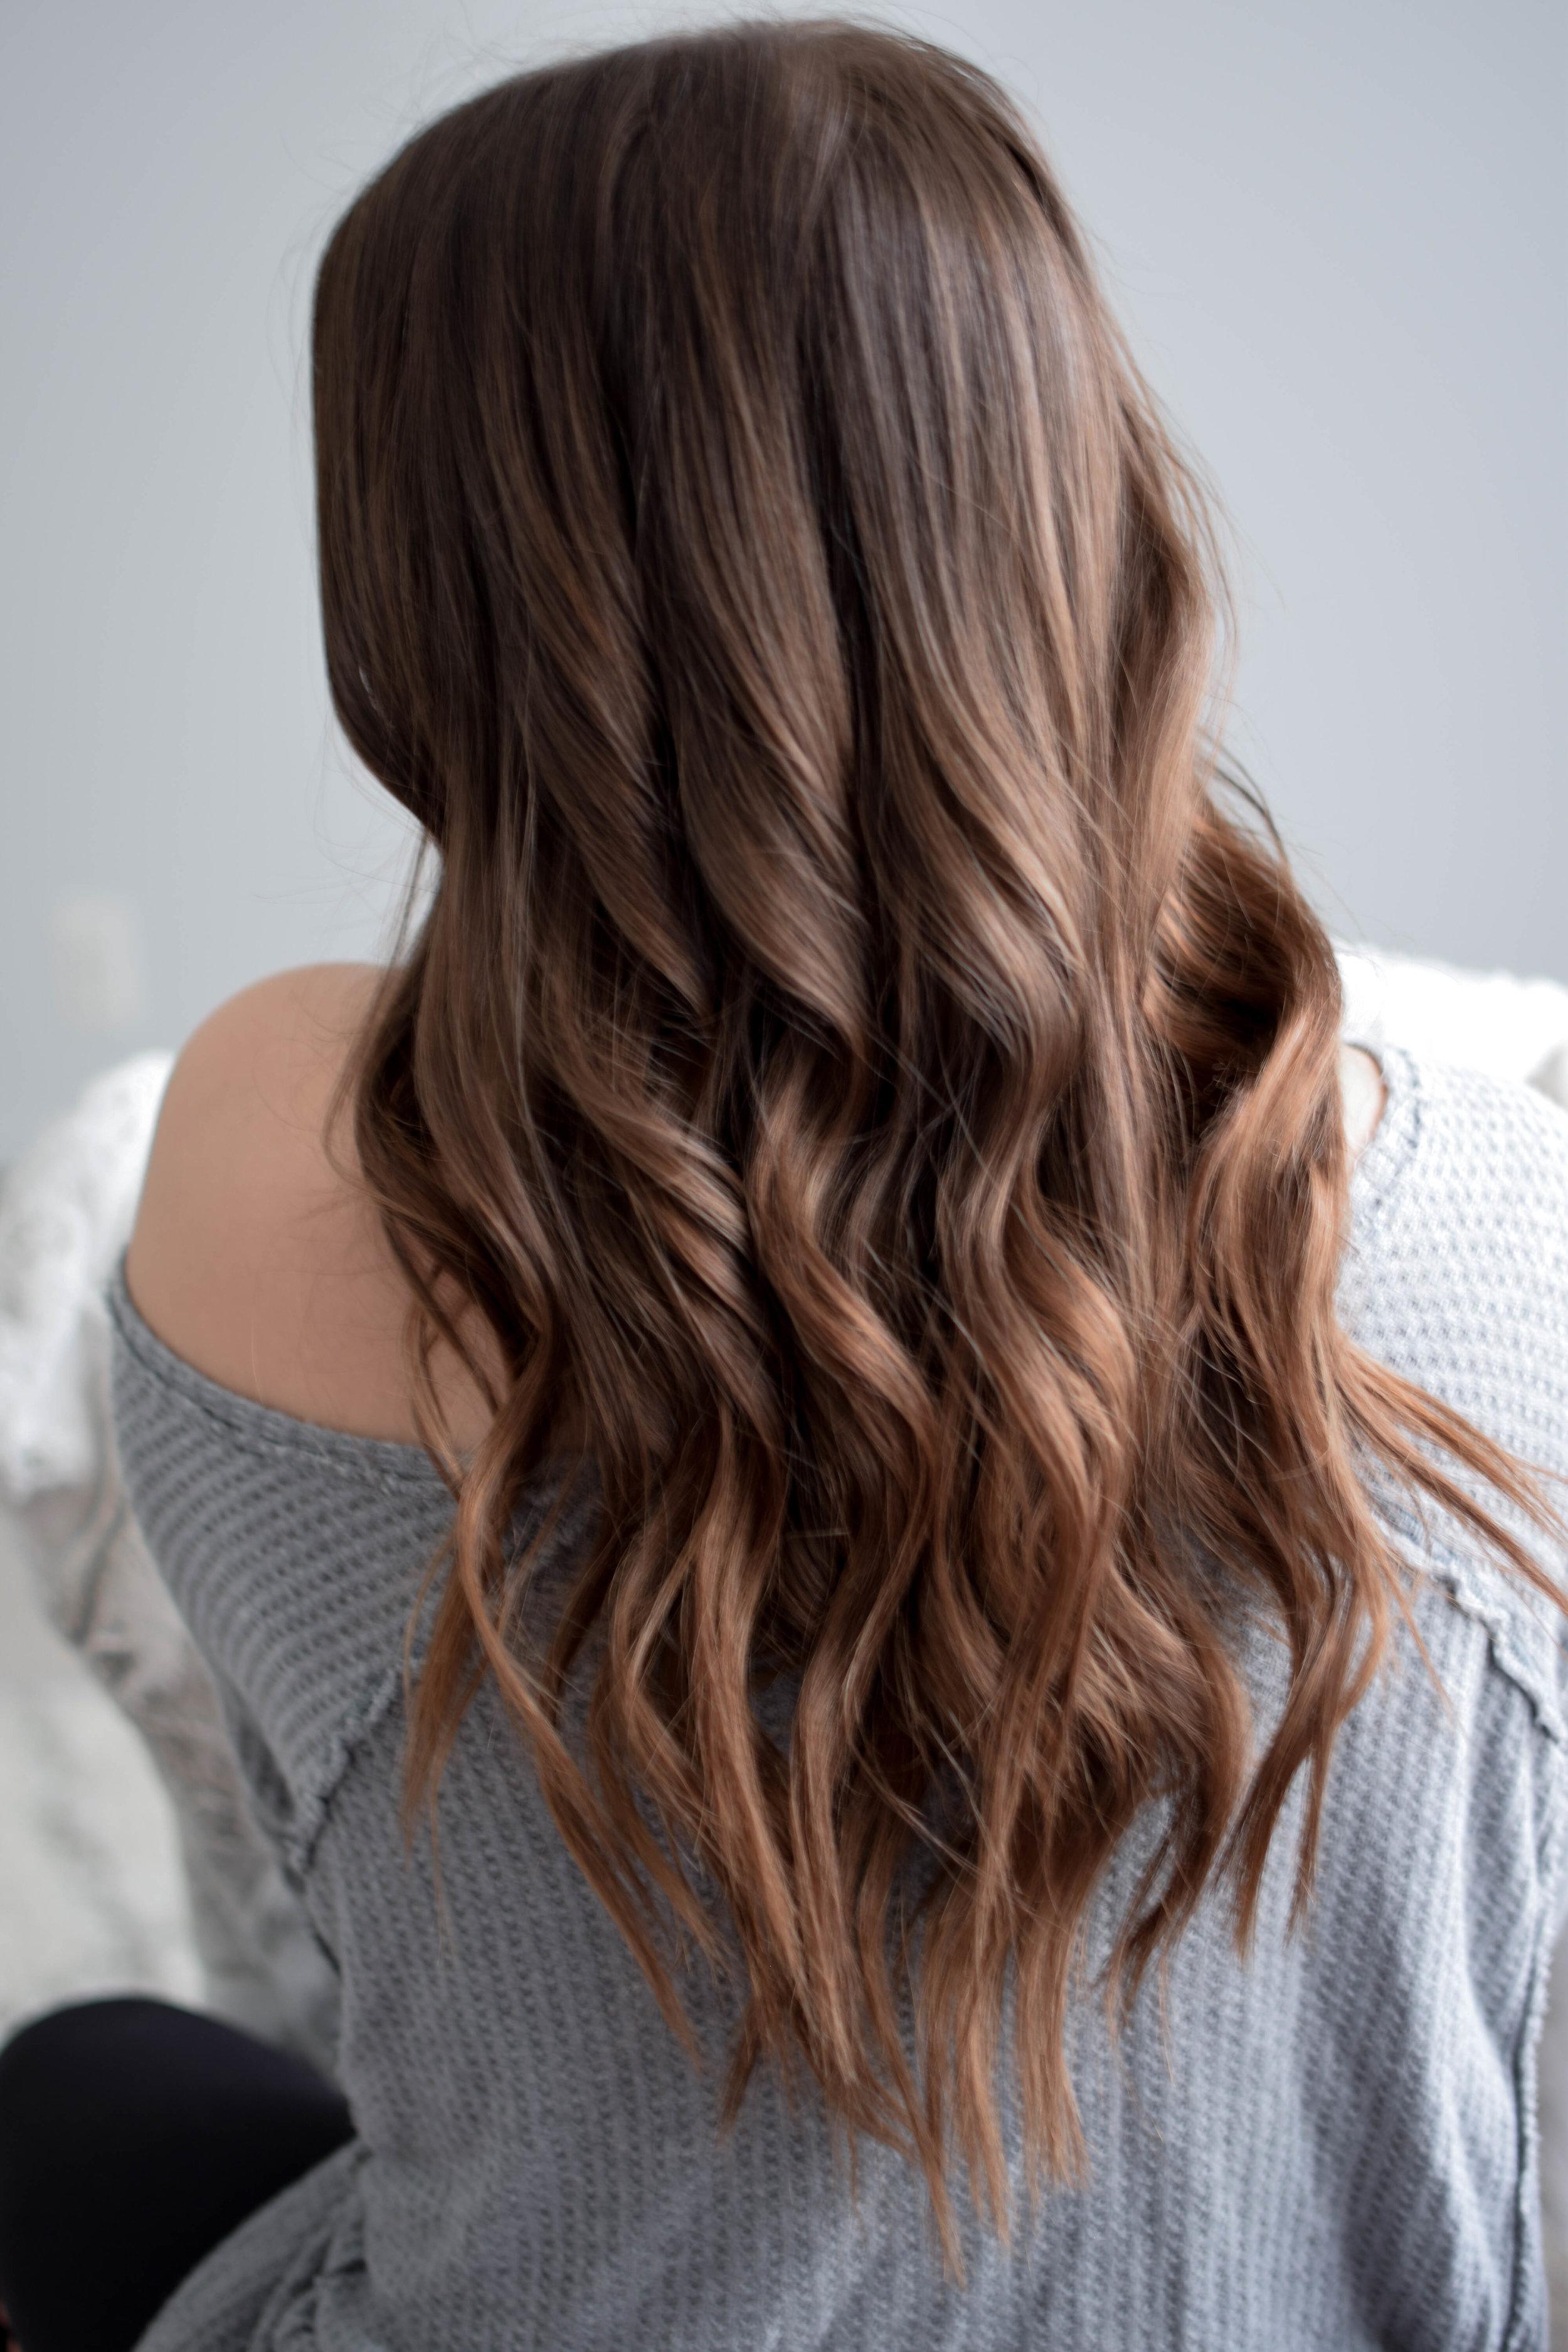 Every Day Waves Hair Tutorial Pine Barren Beauty Curls For Long Hair Loose Waves Hair Tutorial Loose Waves Hair